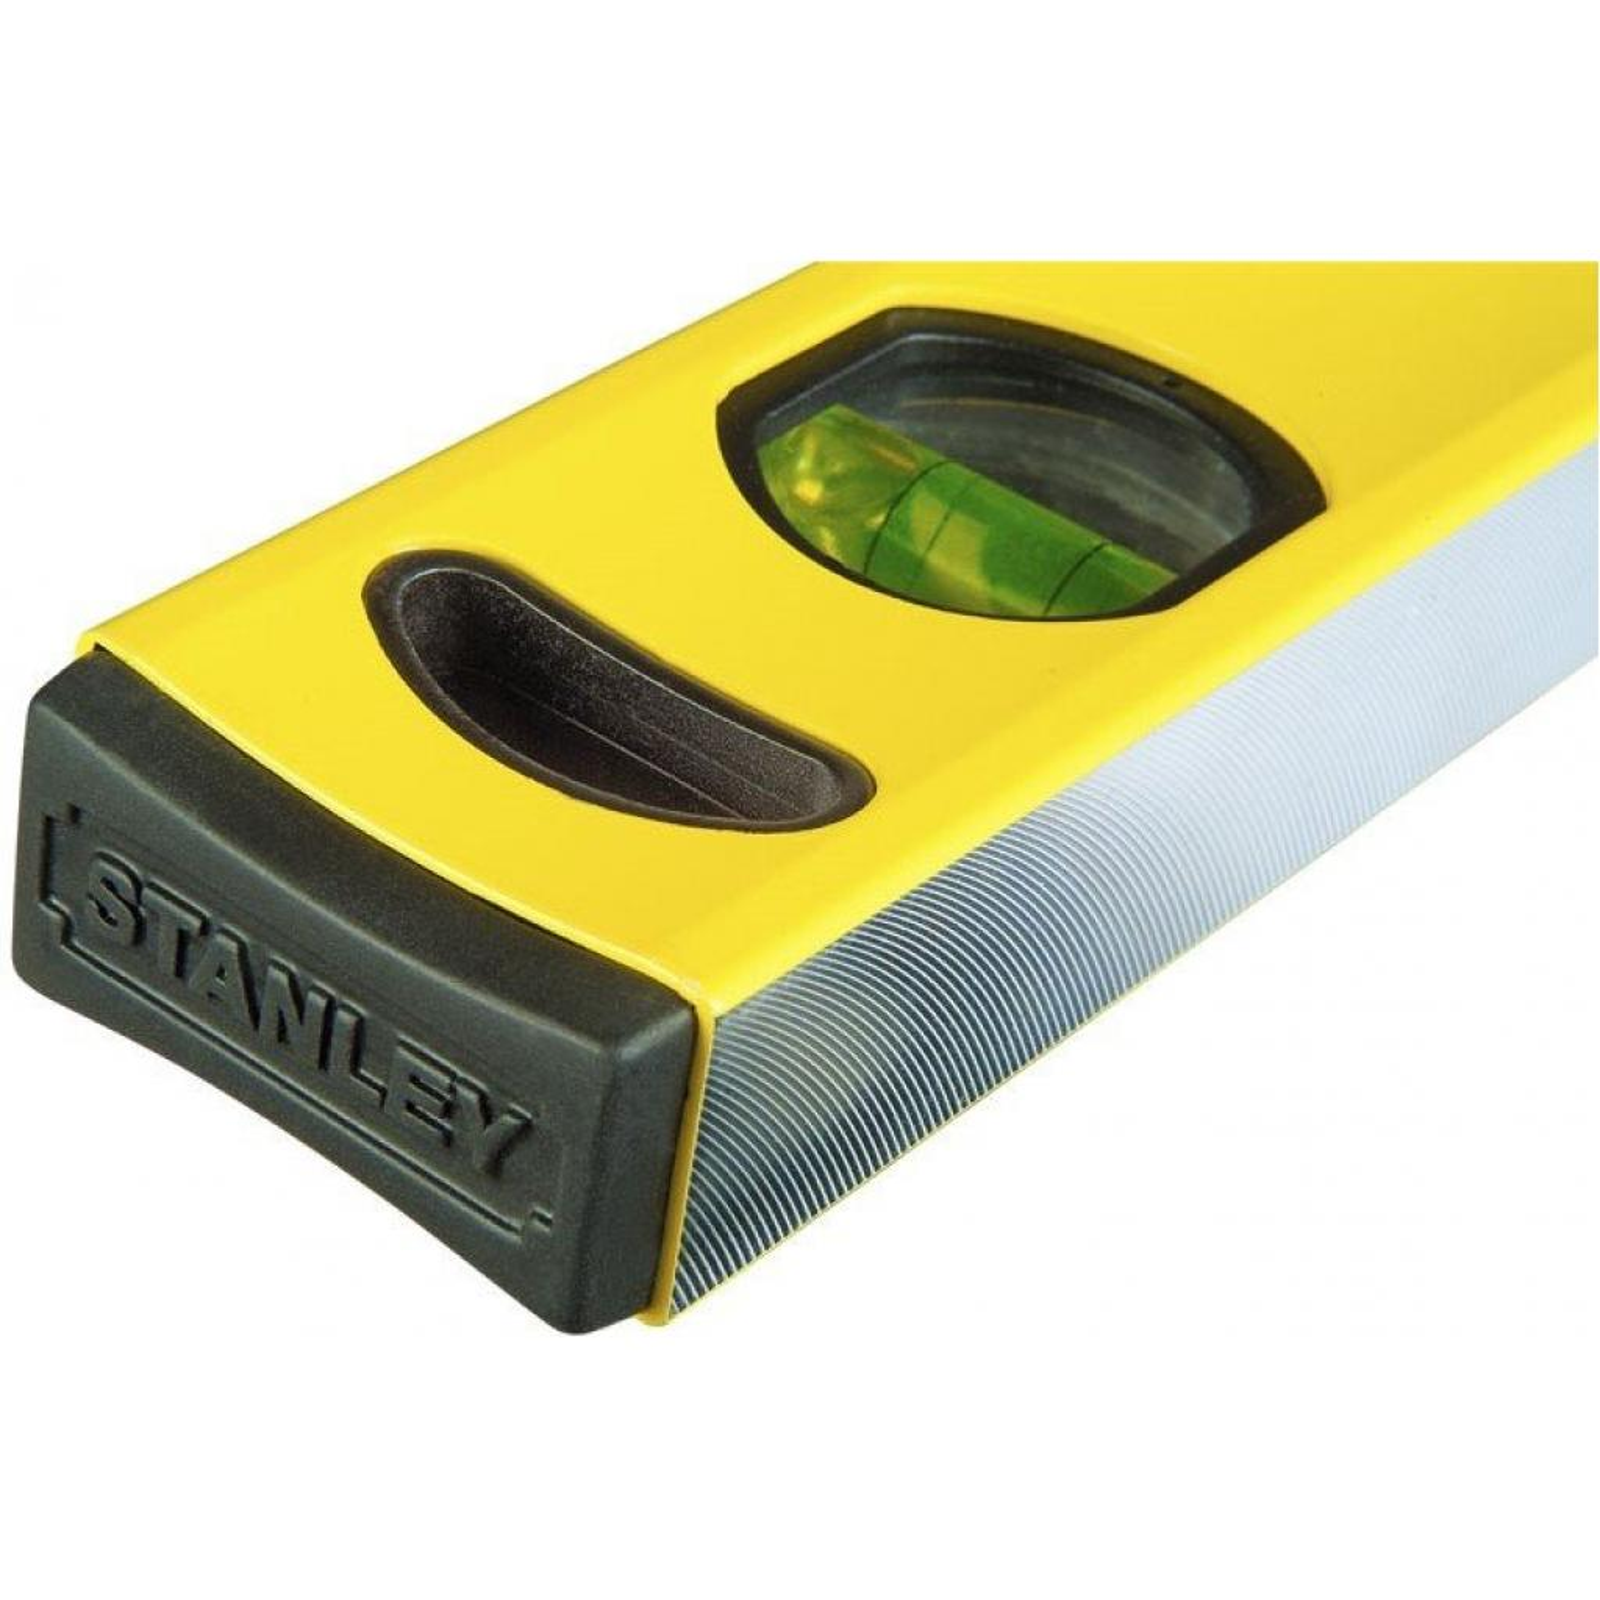 Уровень Stanley Classic Box Level L=400 мм (STHT1-43102) изображение 4